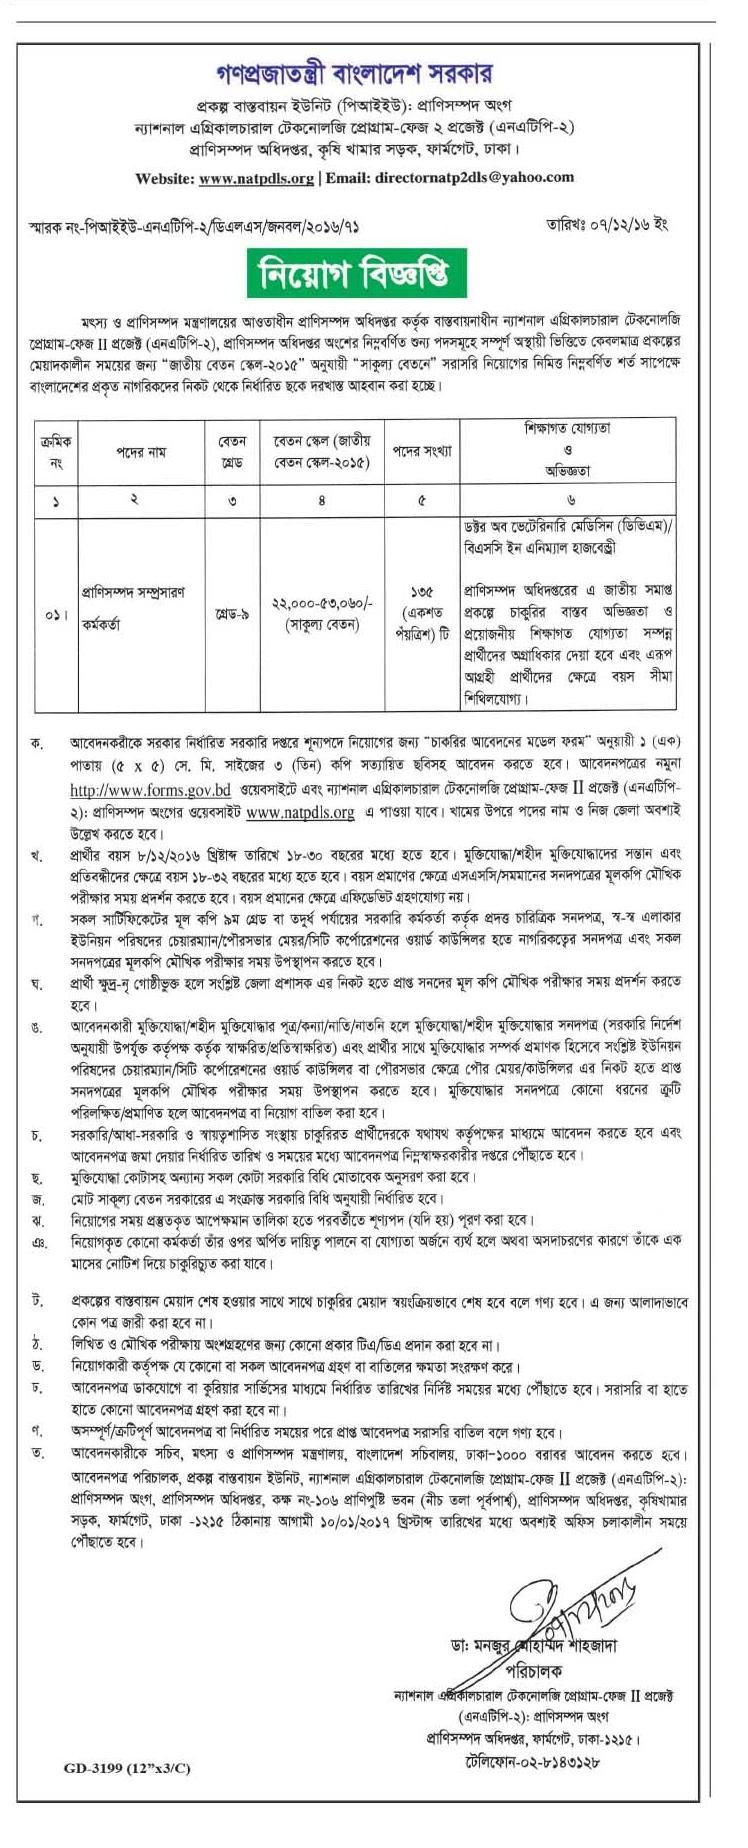 National Agricultural Technology Program Job Circular December 2016.